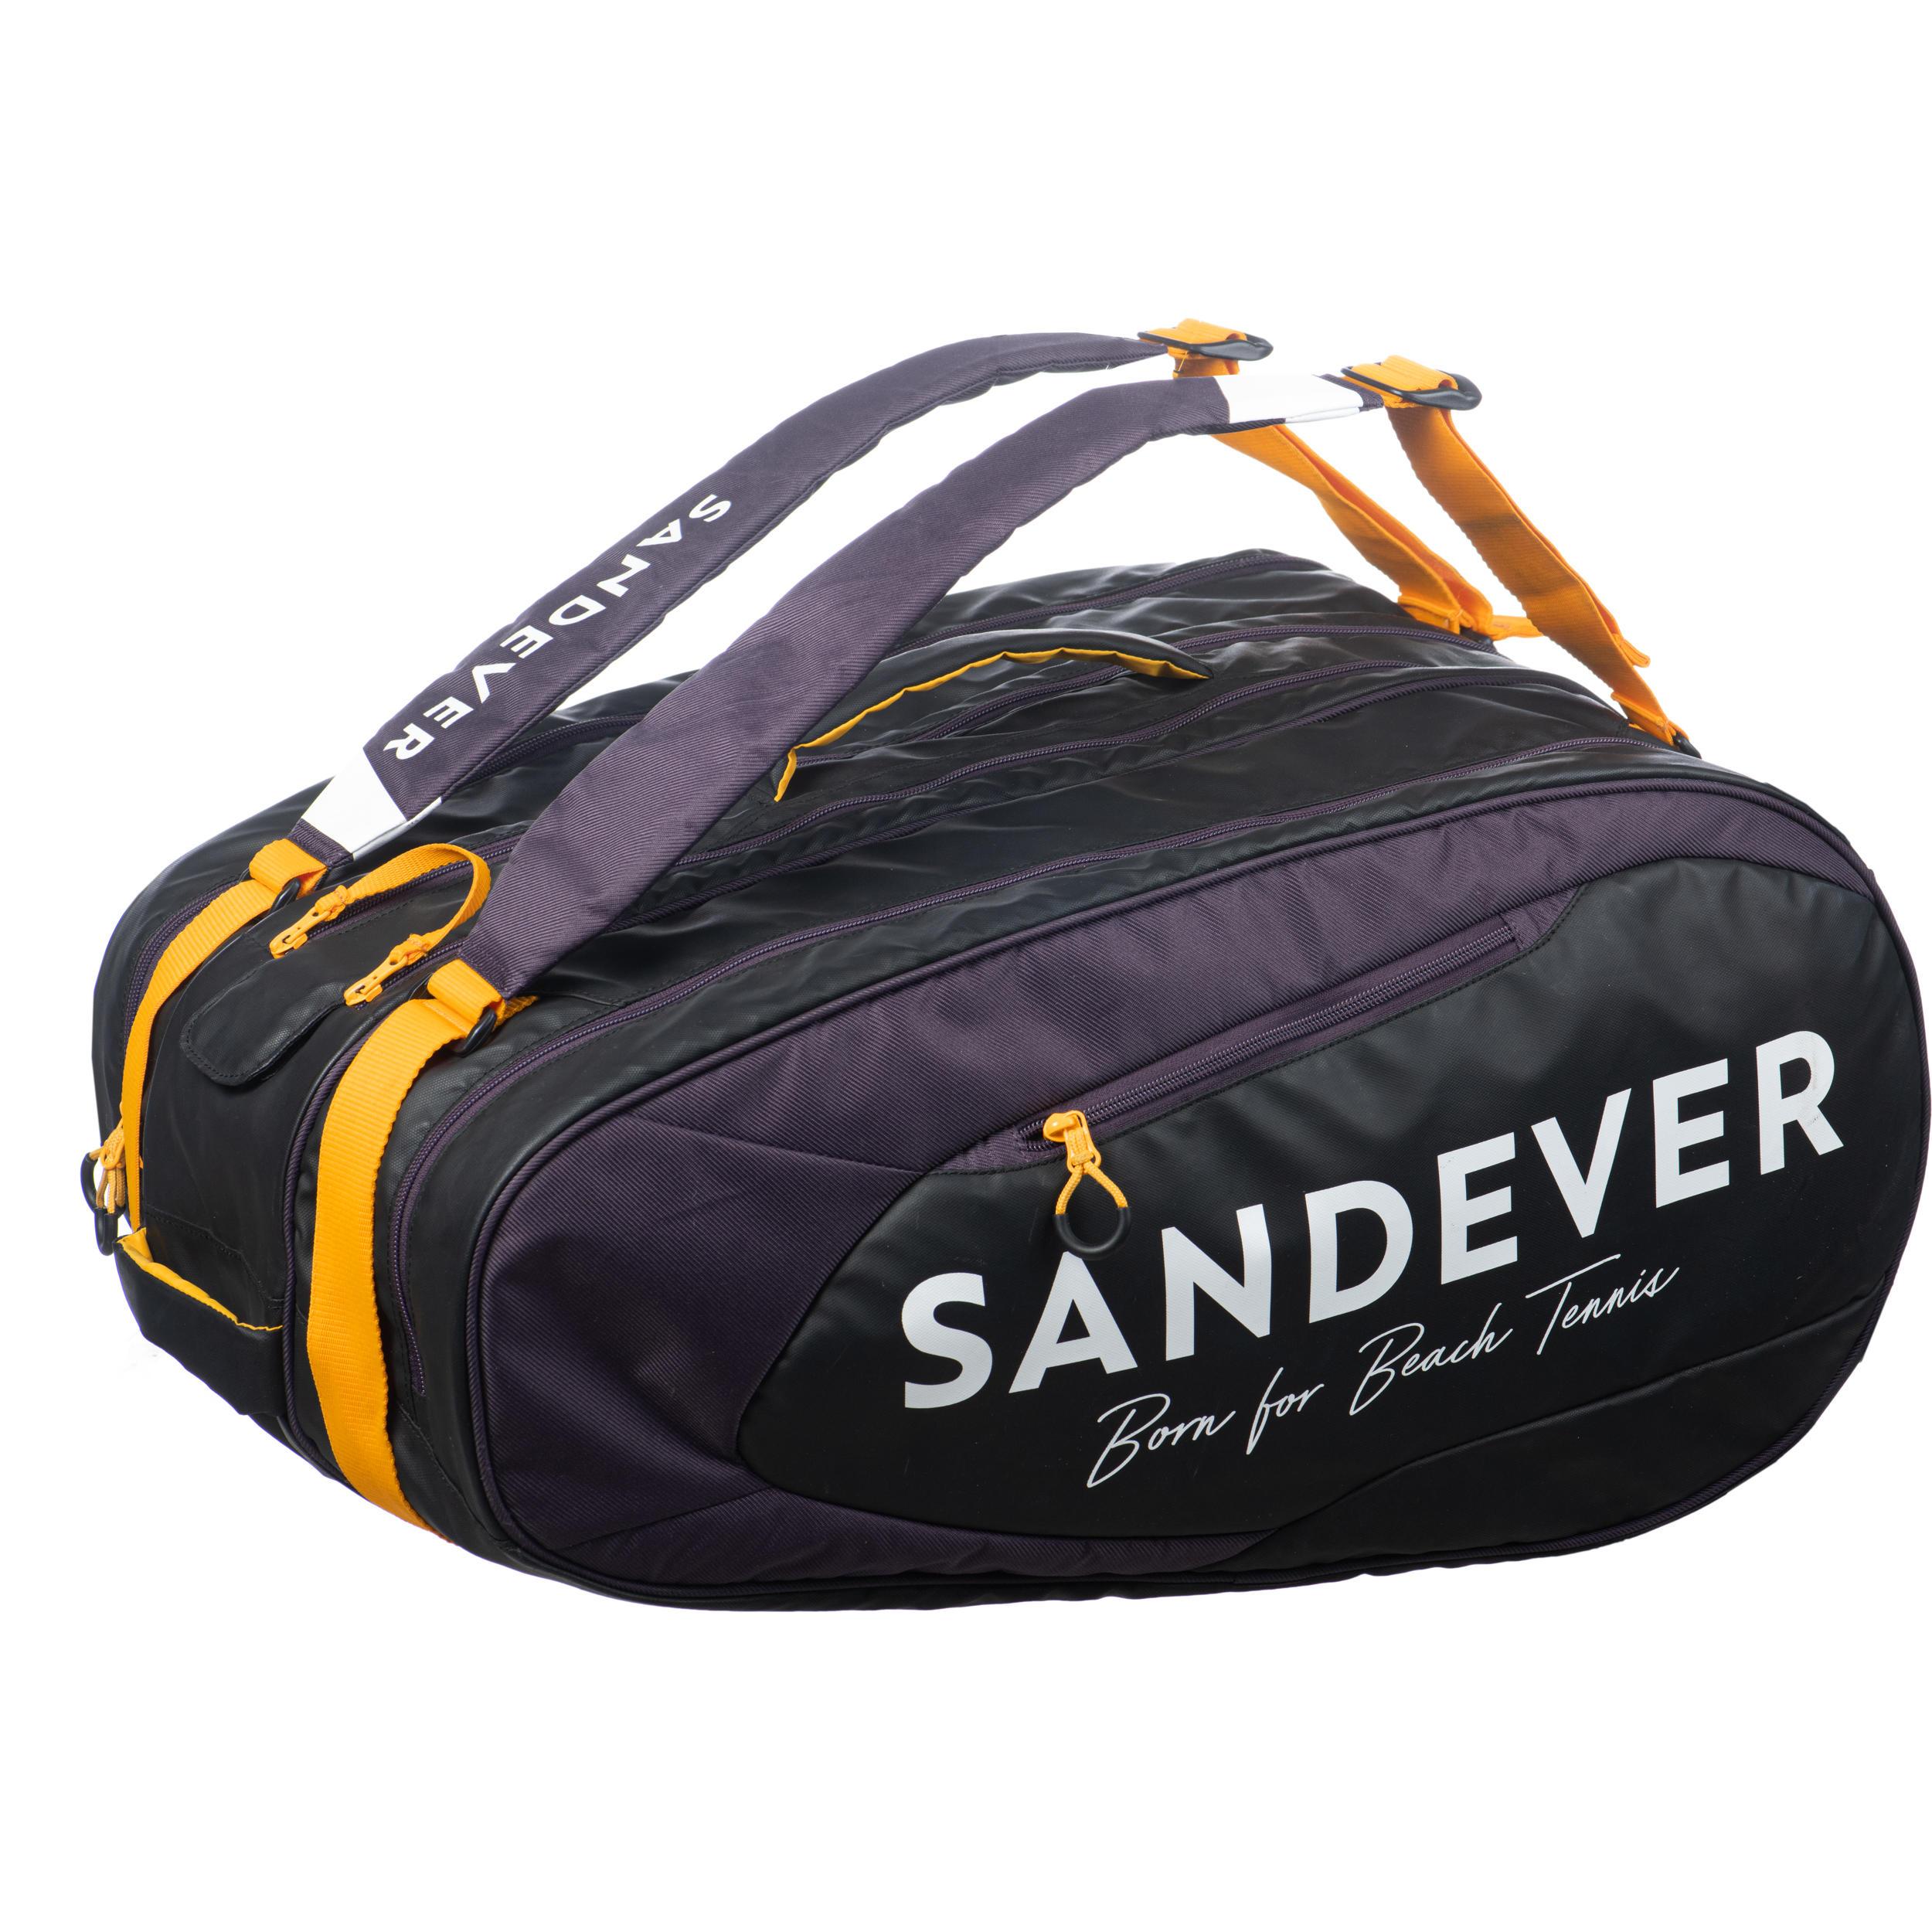 SANDEVER SAC DE BEACH TENNIS BTL 590 O - SANDEVER - Taille unique